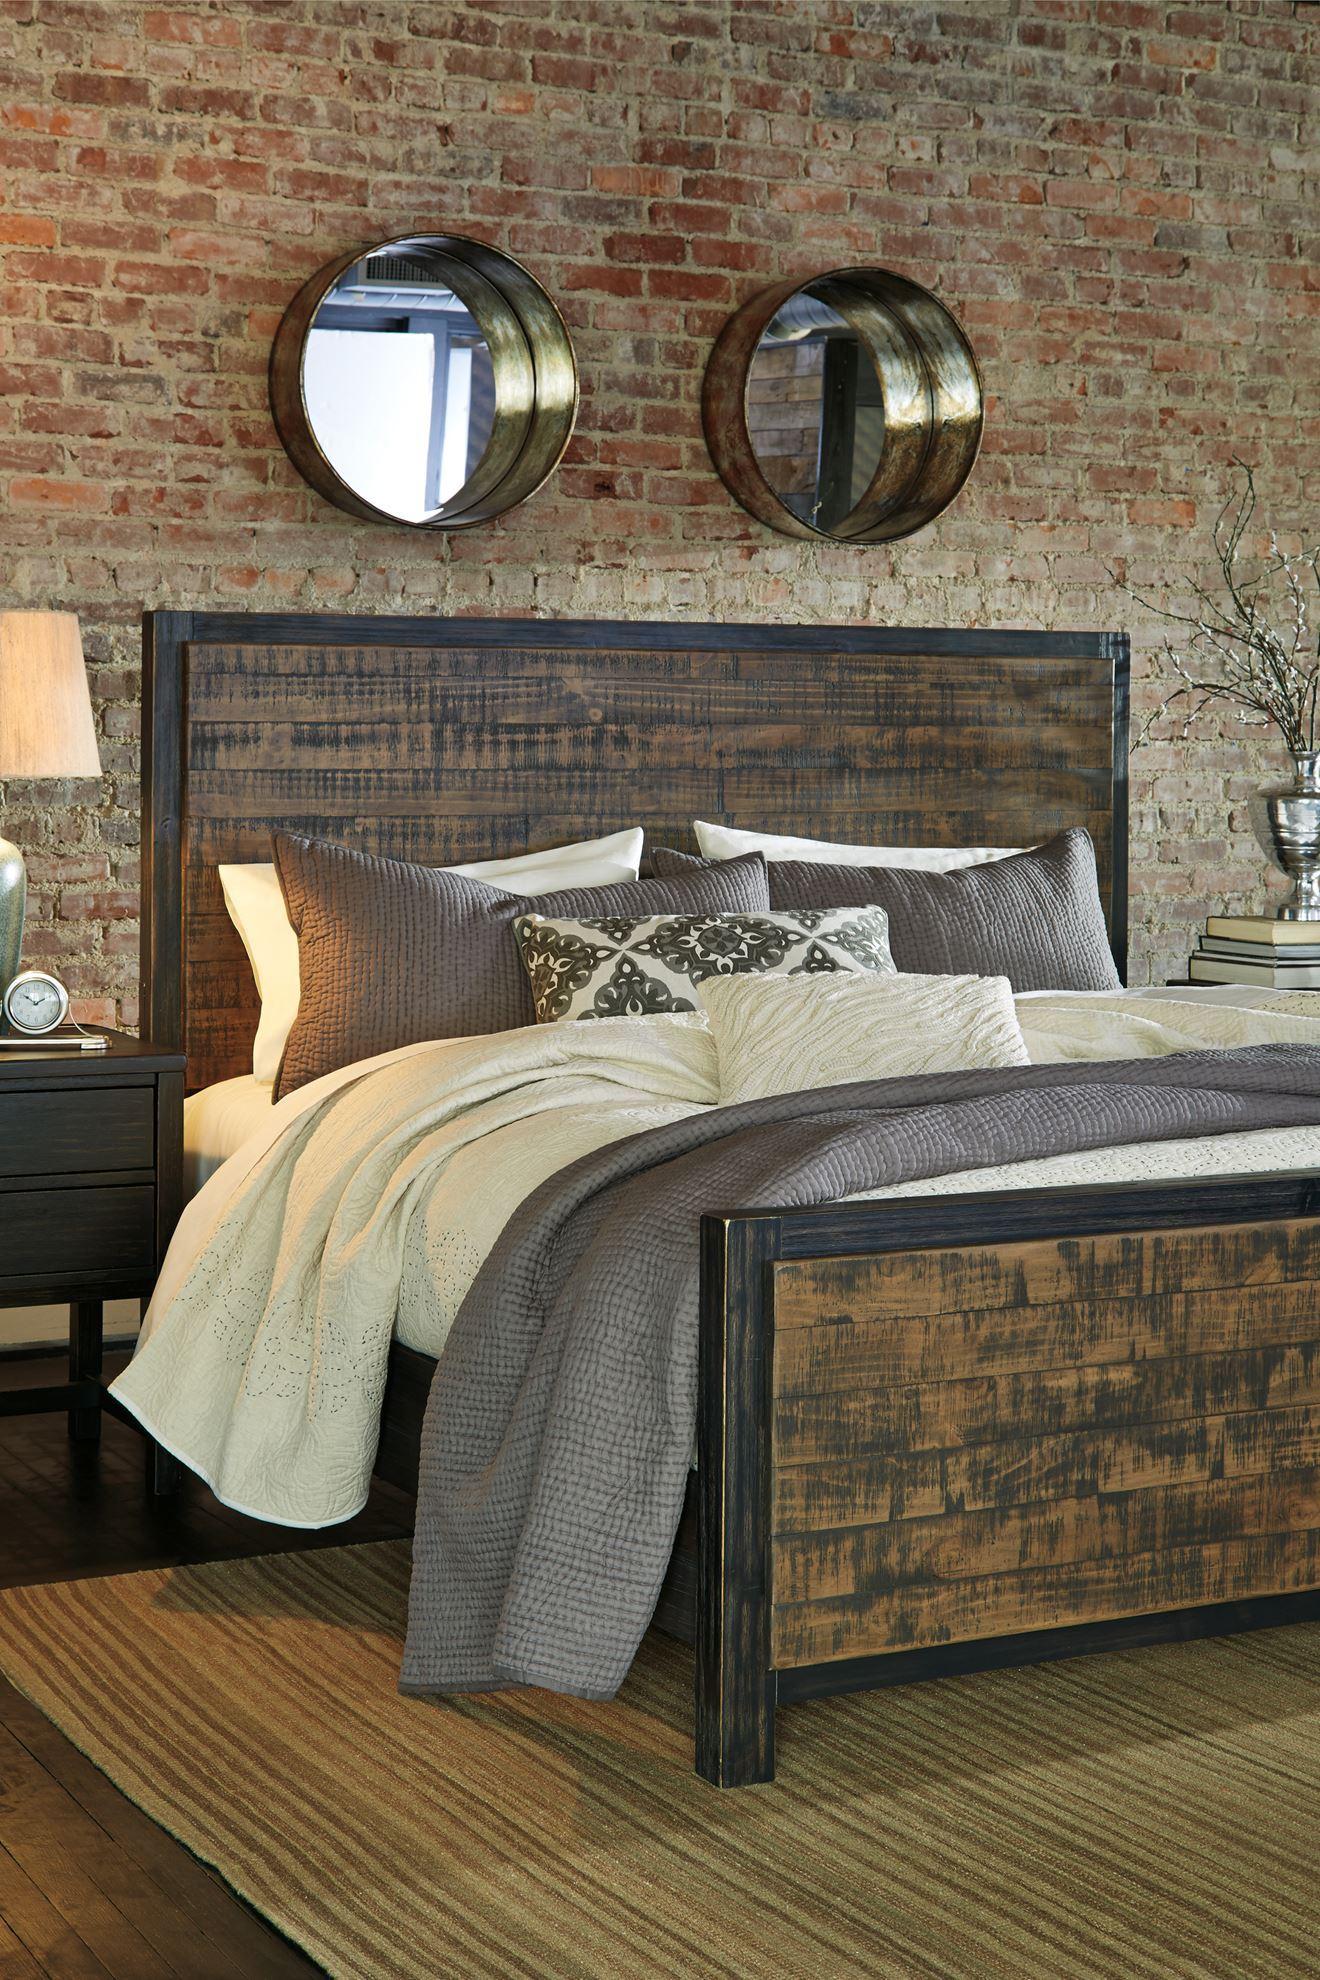 Ashley_0003452_b673-wesling-bedroom-set.jpeg